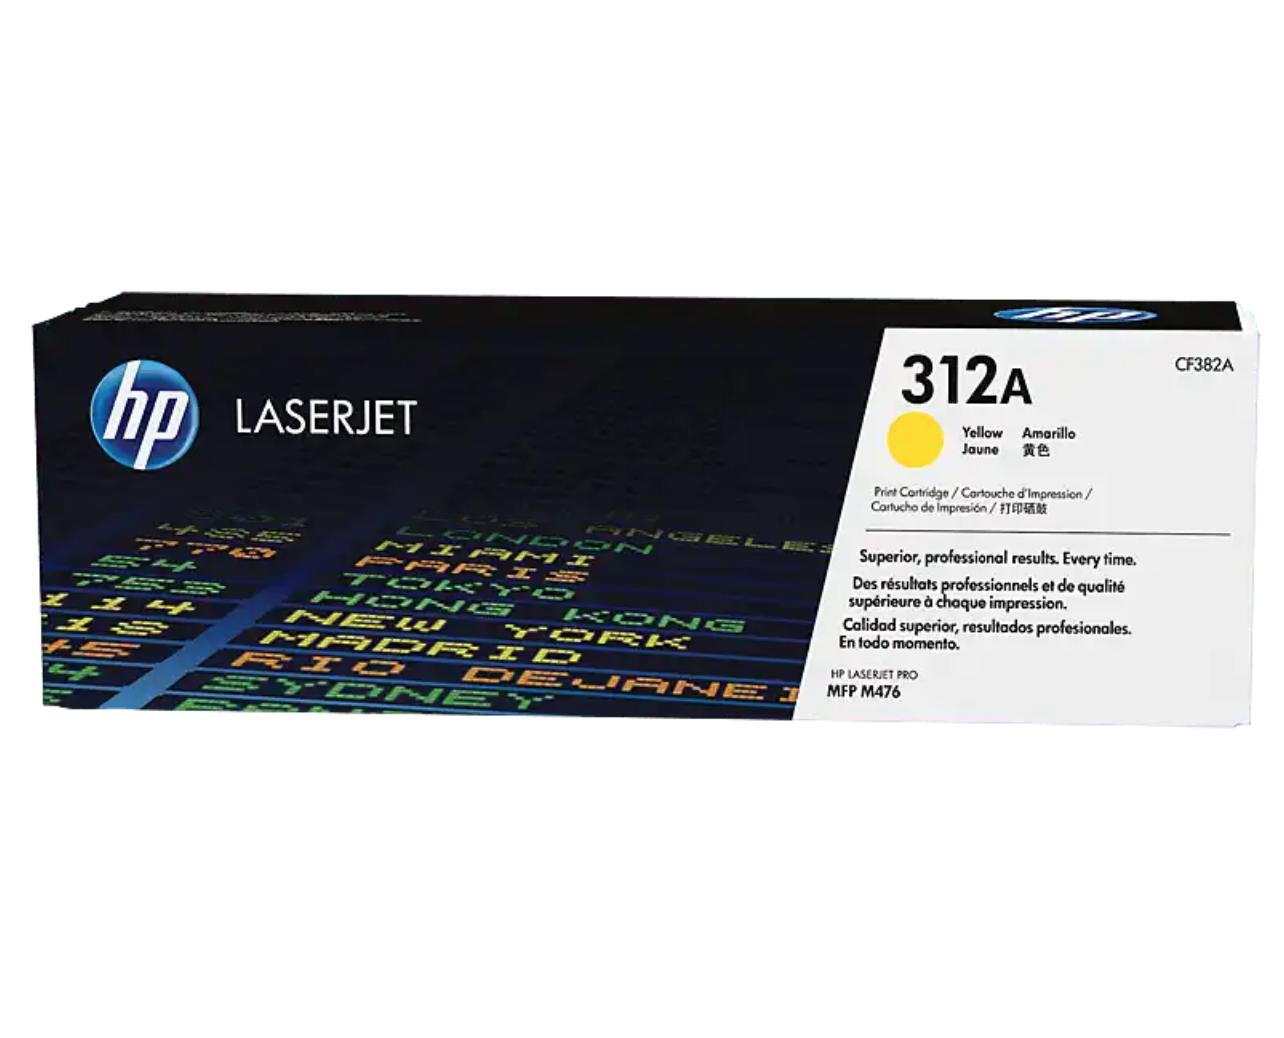 HP 312A 黃色原廠 LaserJet 碳粉 CF382A